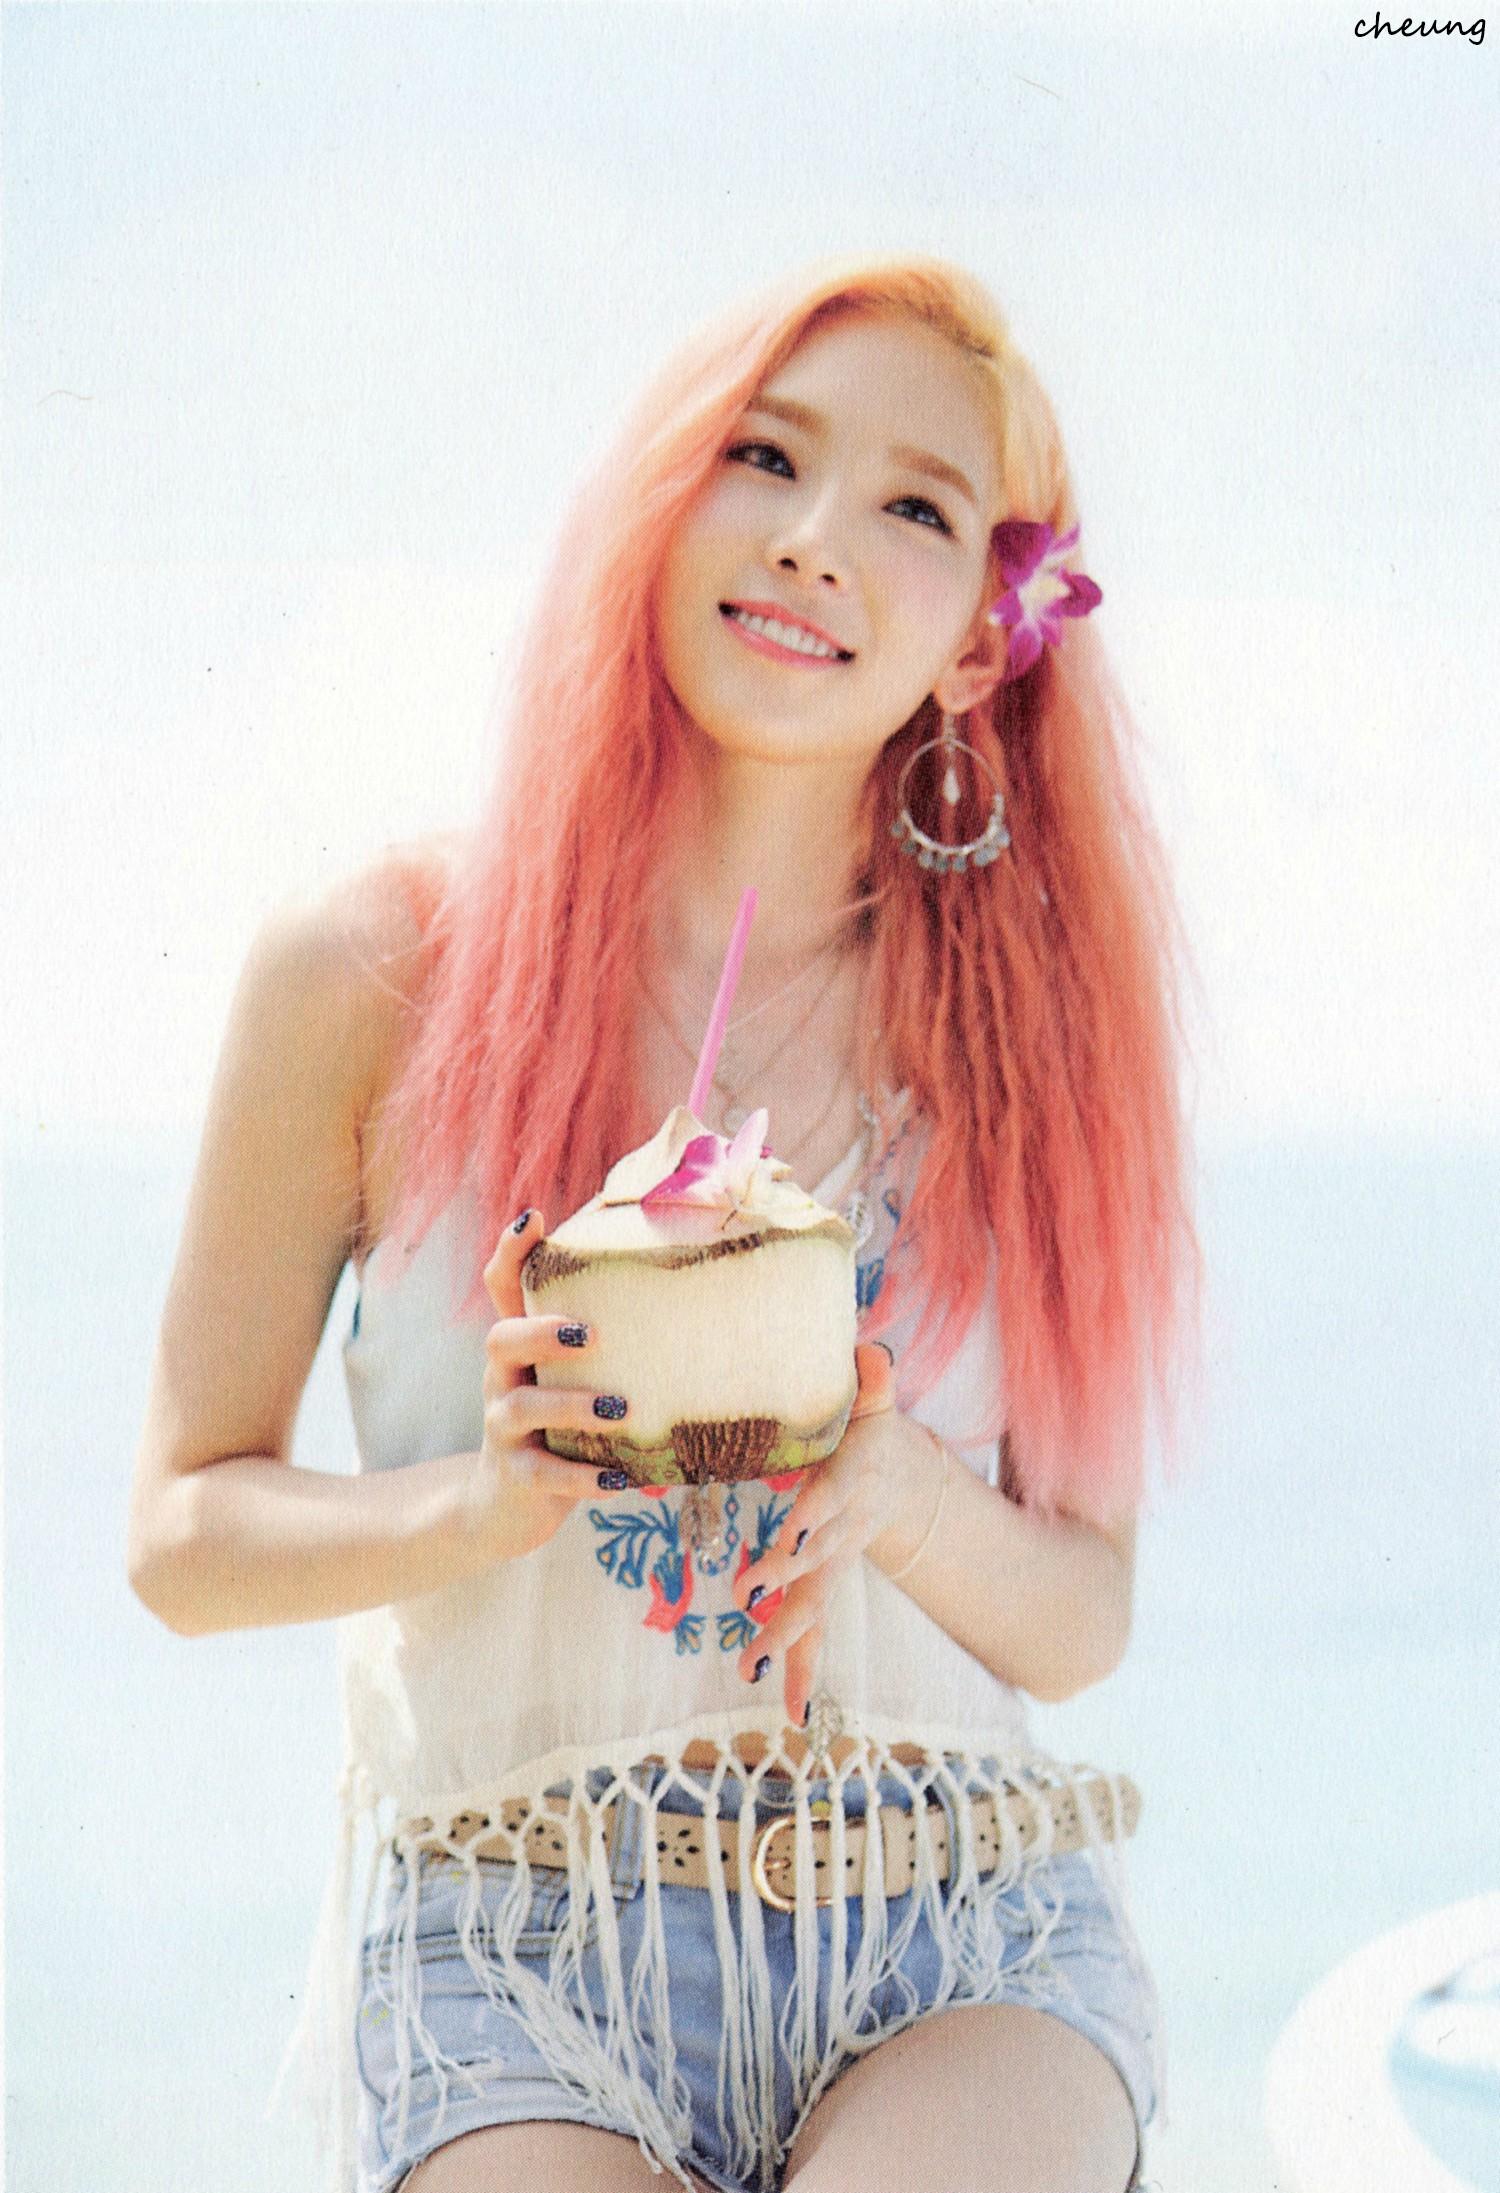 Girls Generation Tiffany Wallpaper Taeyeon Snsd Images Kim Taeyeon Party 2015 Hd Wallpaper